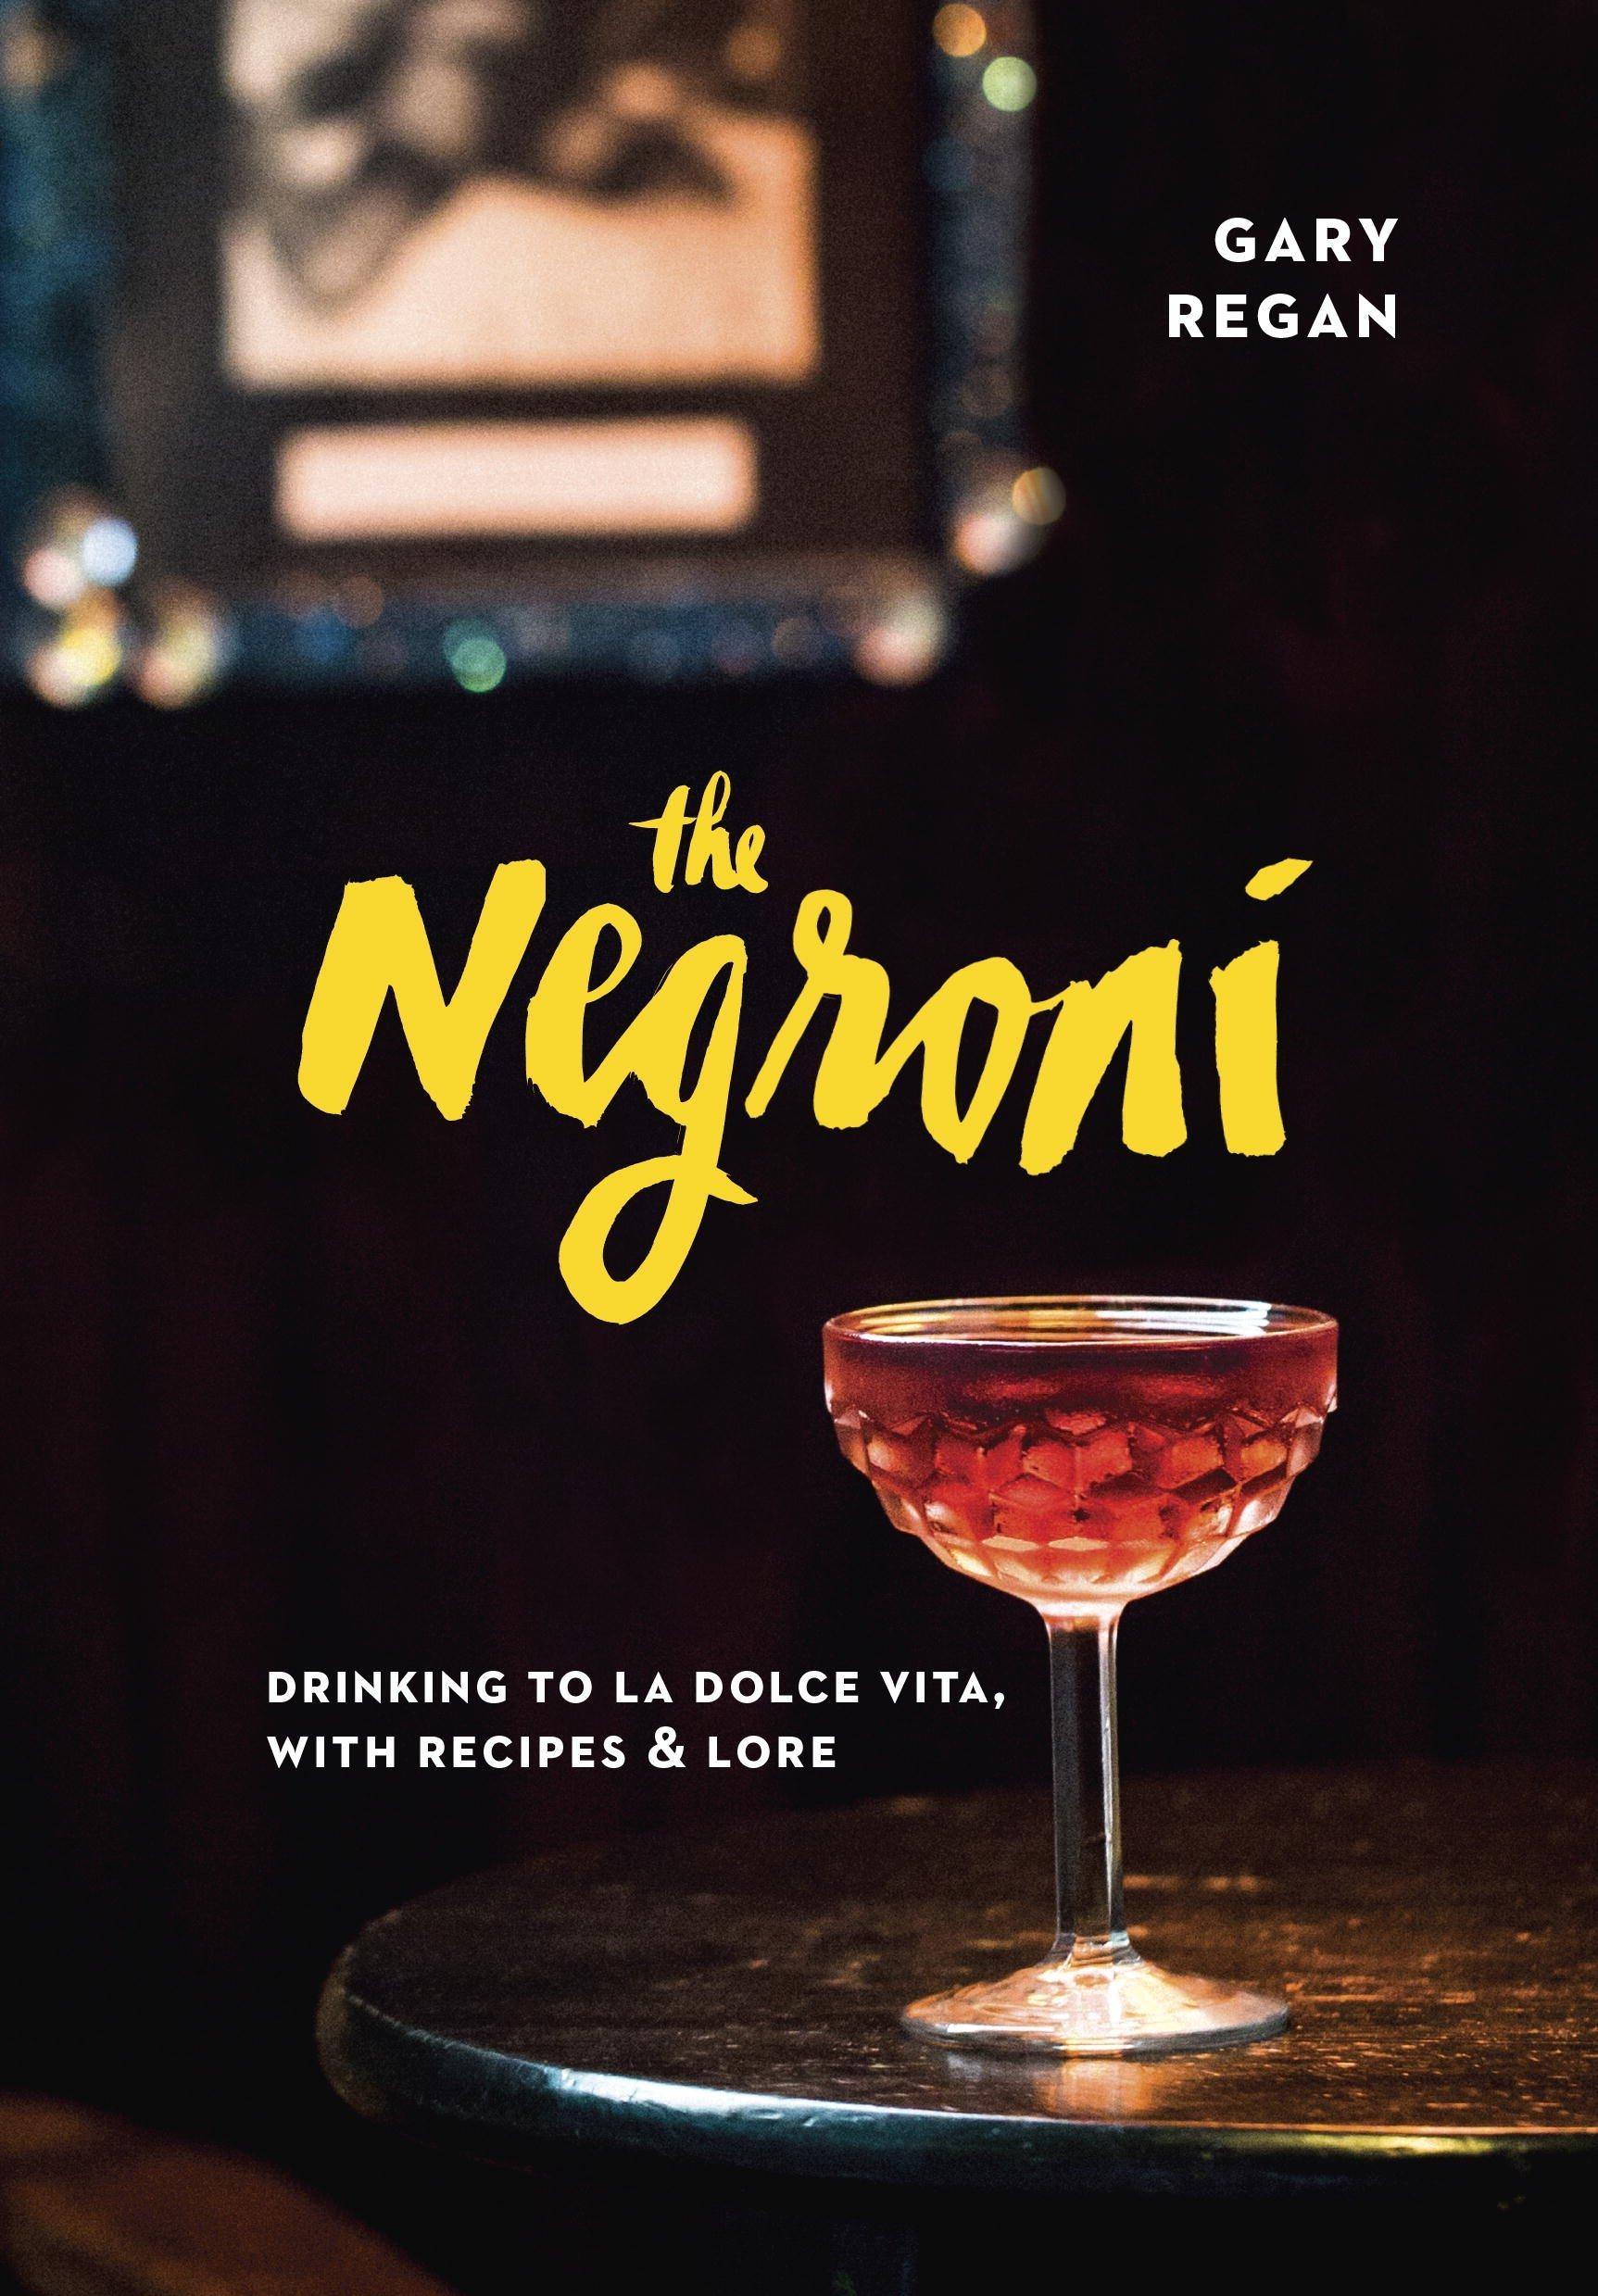 Negroni Drinking Dolce Vita Recipes